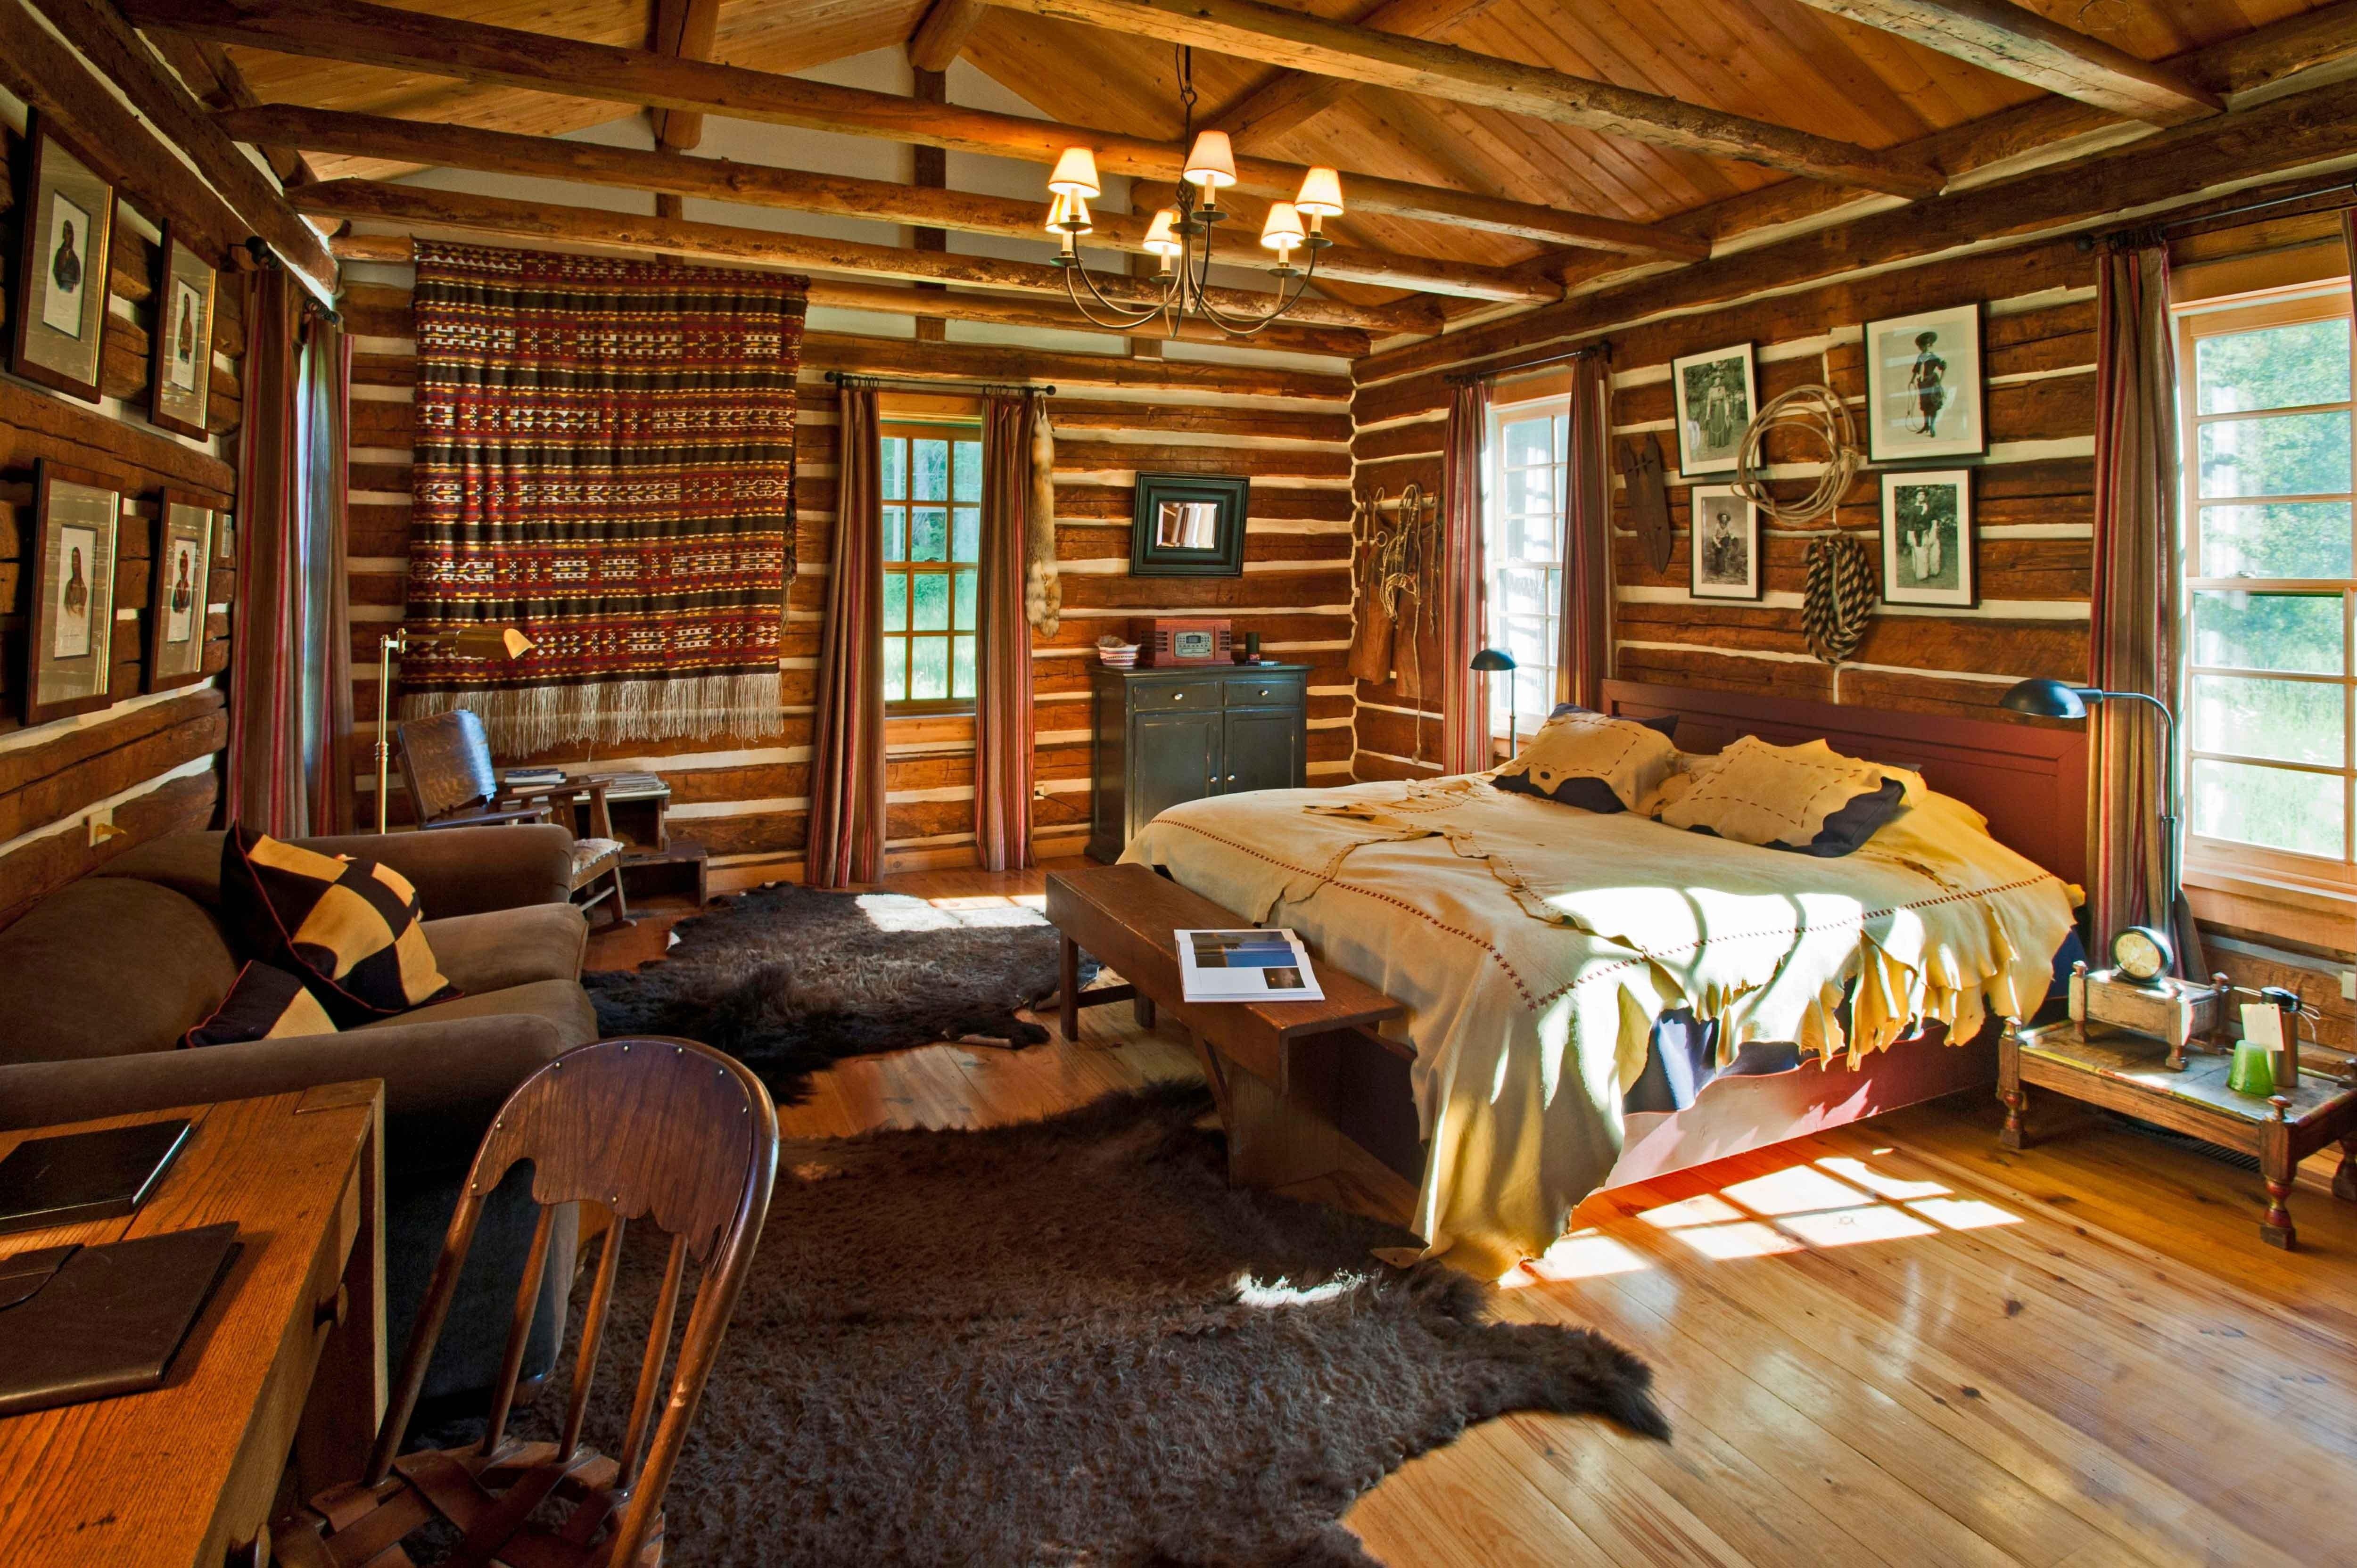 10 Most Popular Log Cabin Interior Design Ideas rustic cabin interior design ideas deboto home design rustic 2020